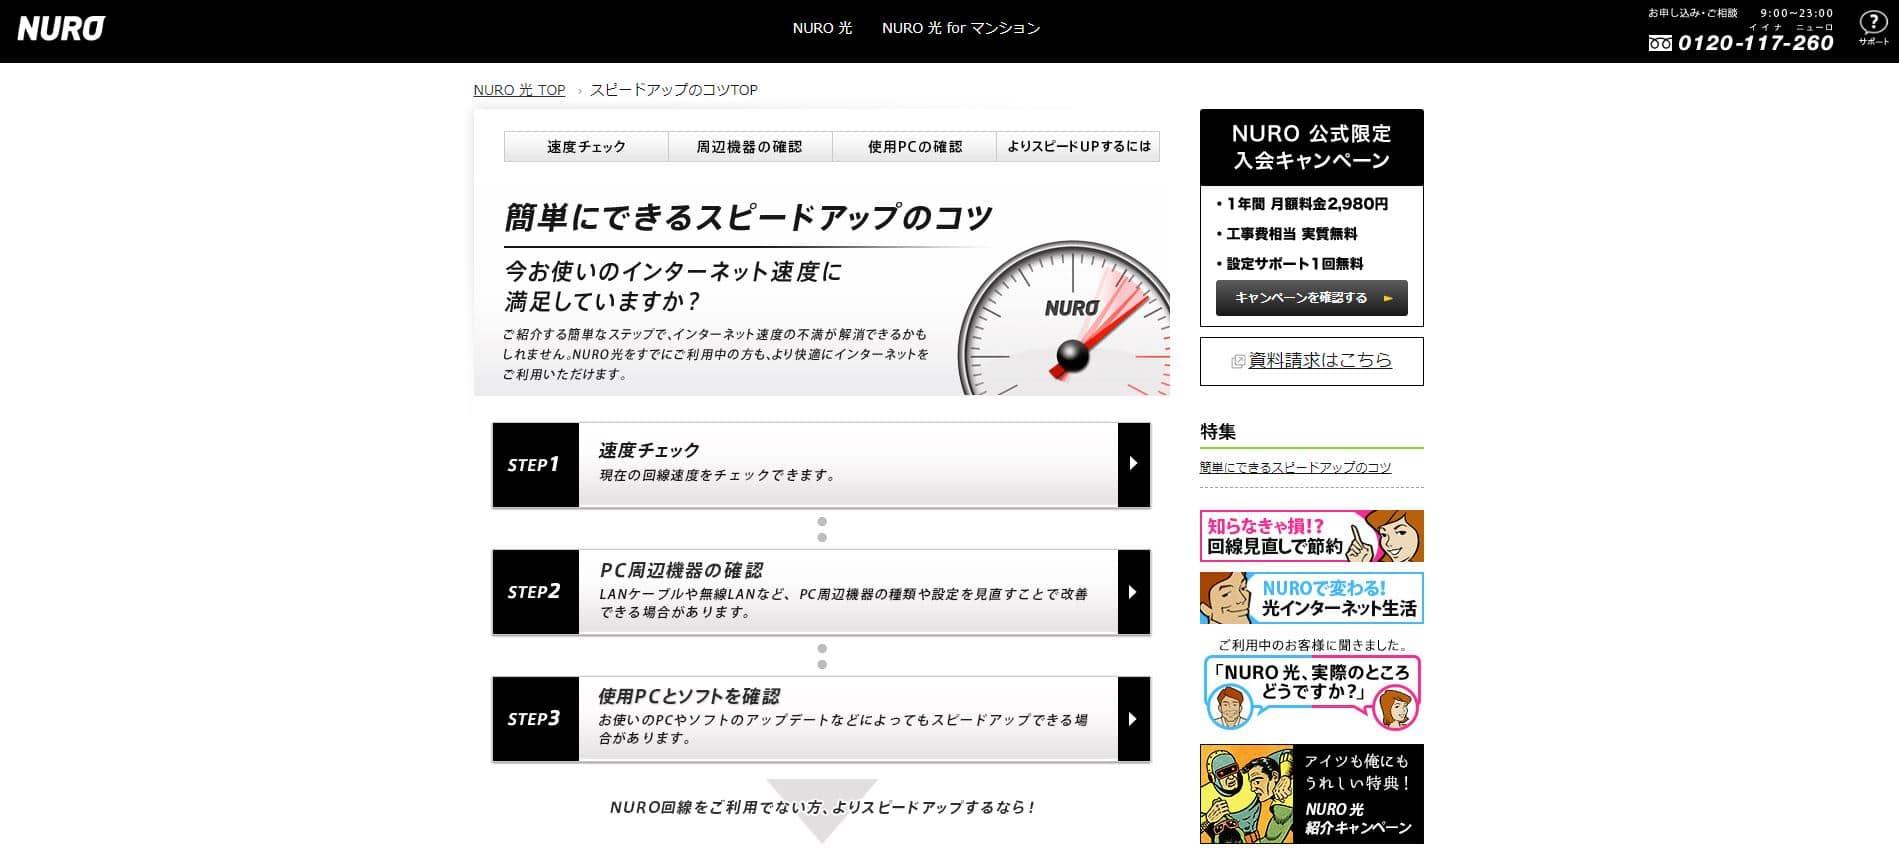 NURO光公式サイト 速度測定03